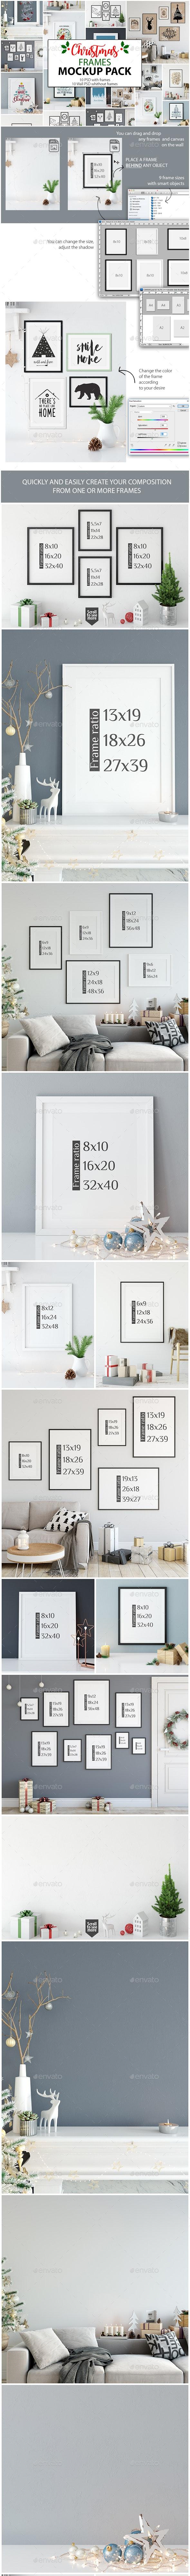 Christmas Frame Mockup Pack - Print Product Mock-Ups